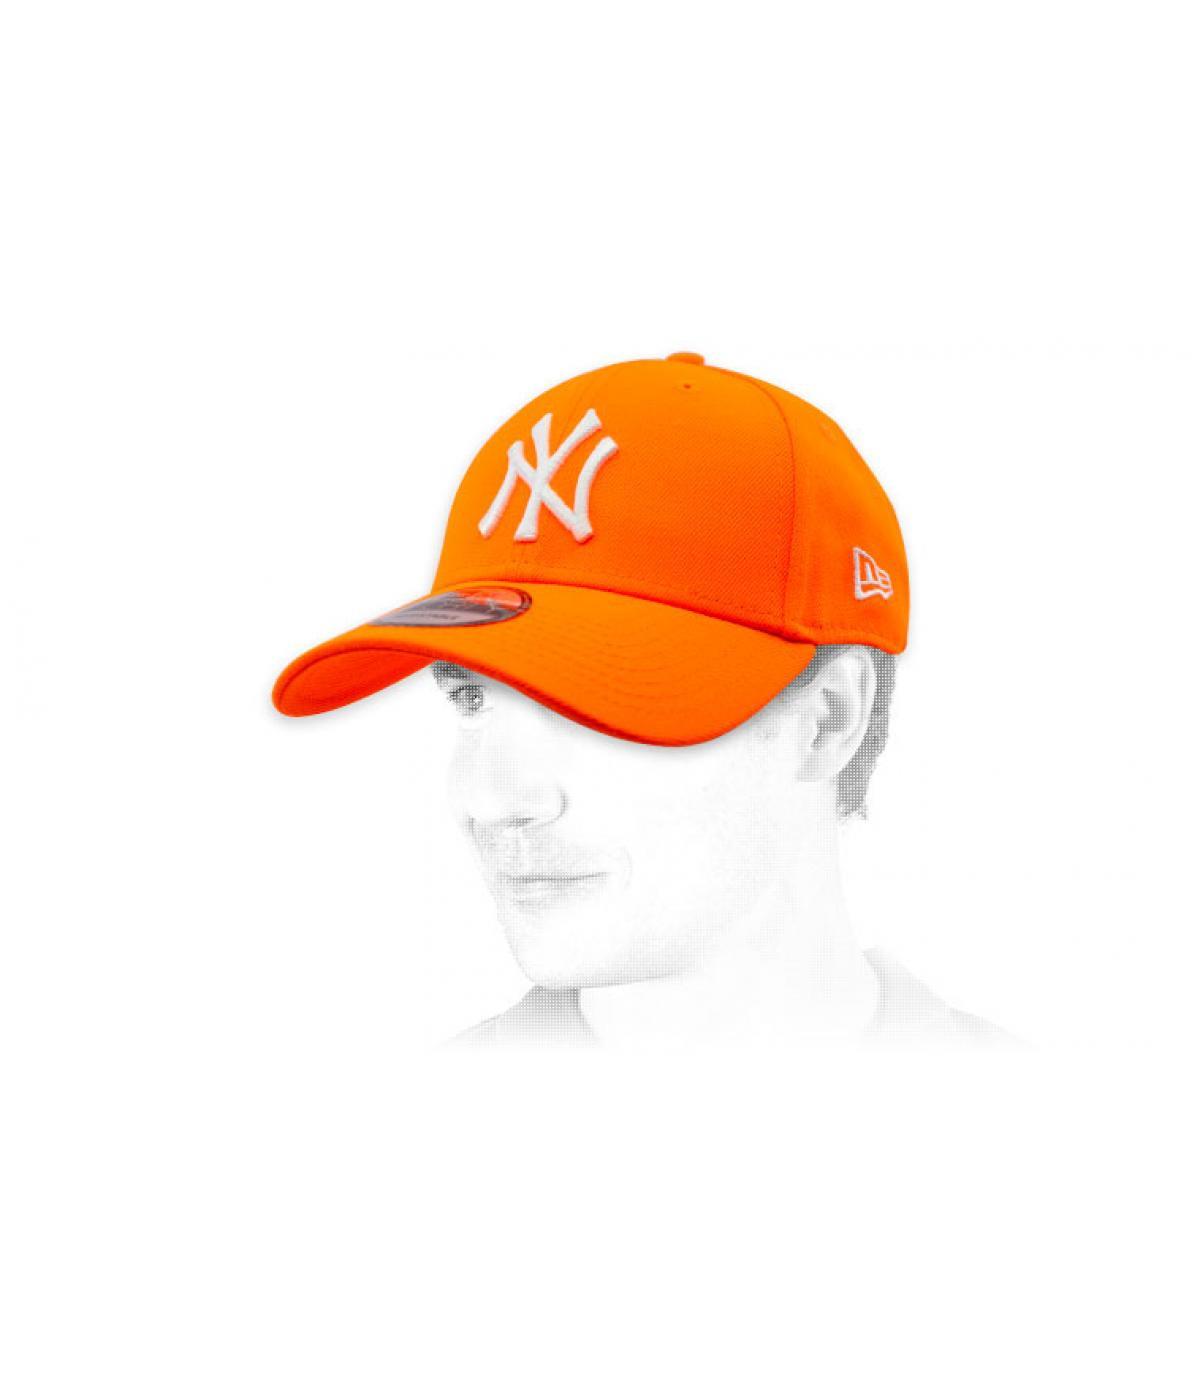 Casquette NY orange leuchtend